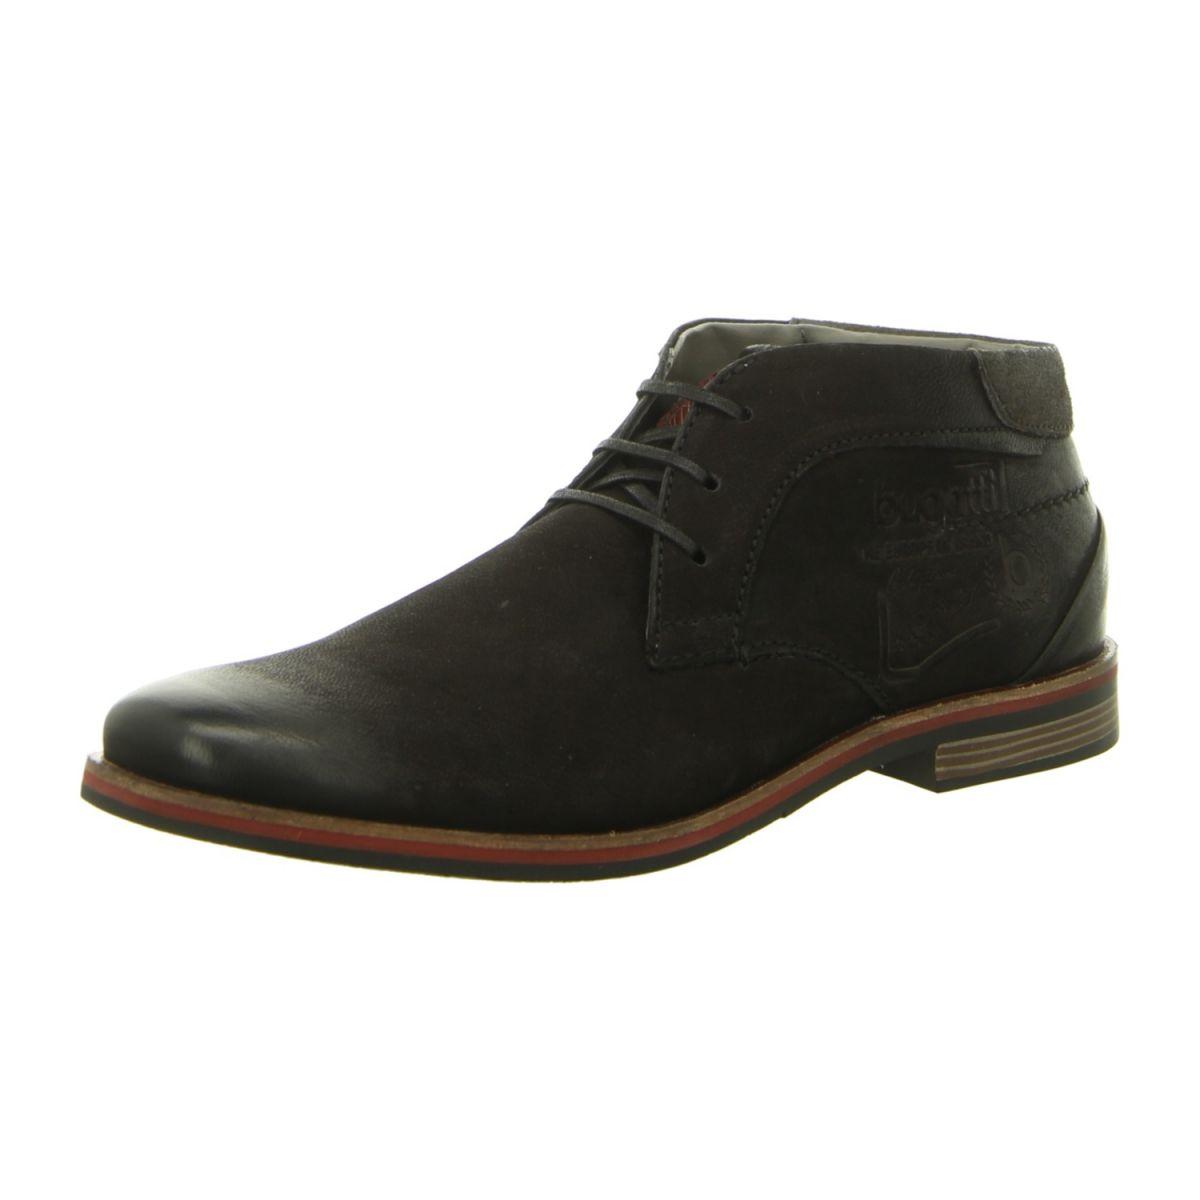 Boots et bottines - BUGATTI ABRAMO 312 17301 PkABBDqr